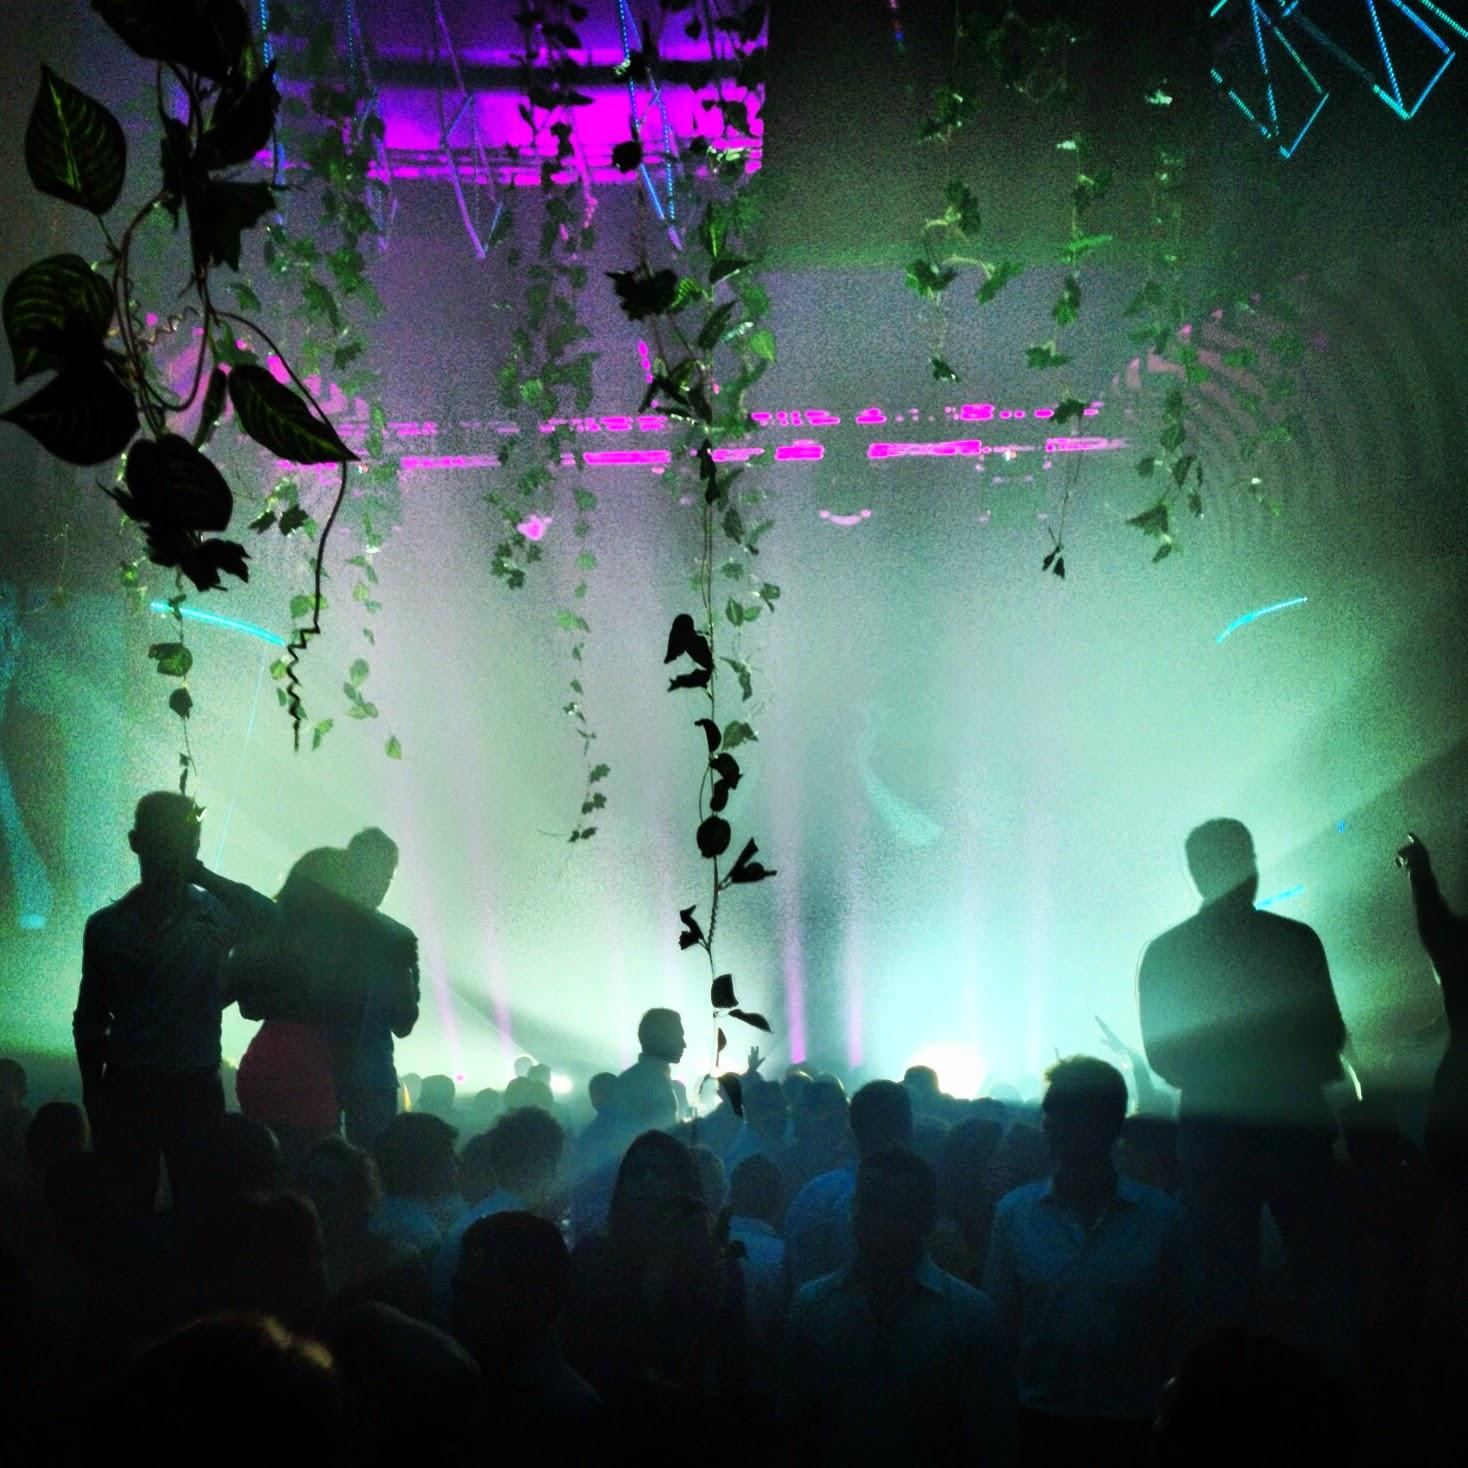 Party, Mansion, Club, Shot, Drinks, Girls, Fun